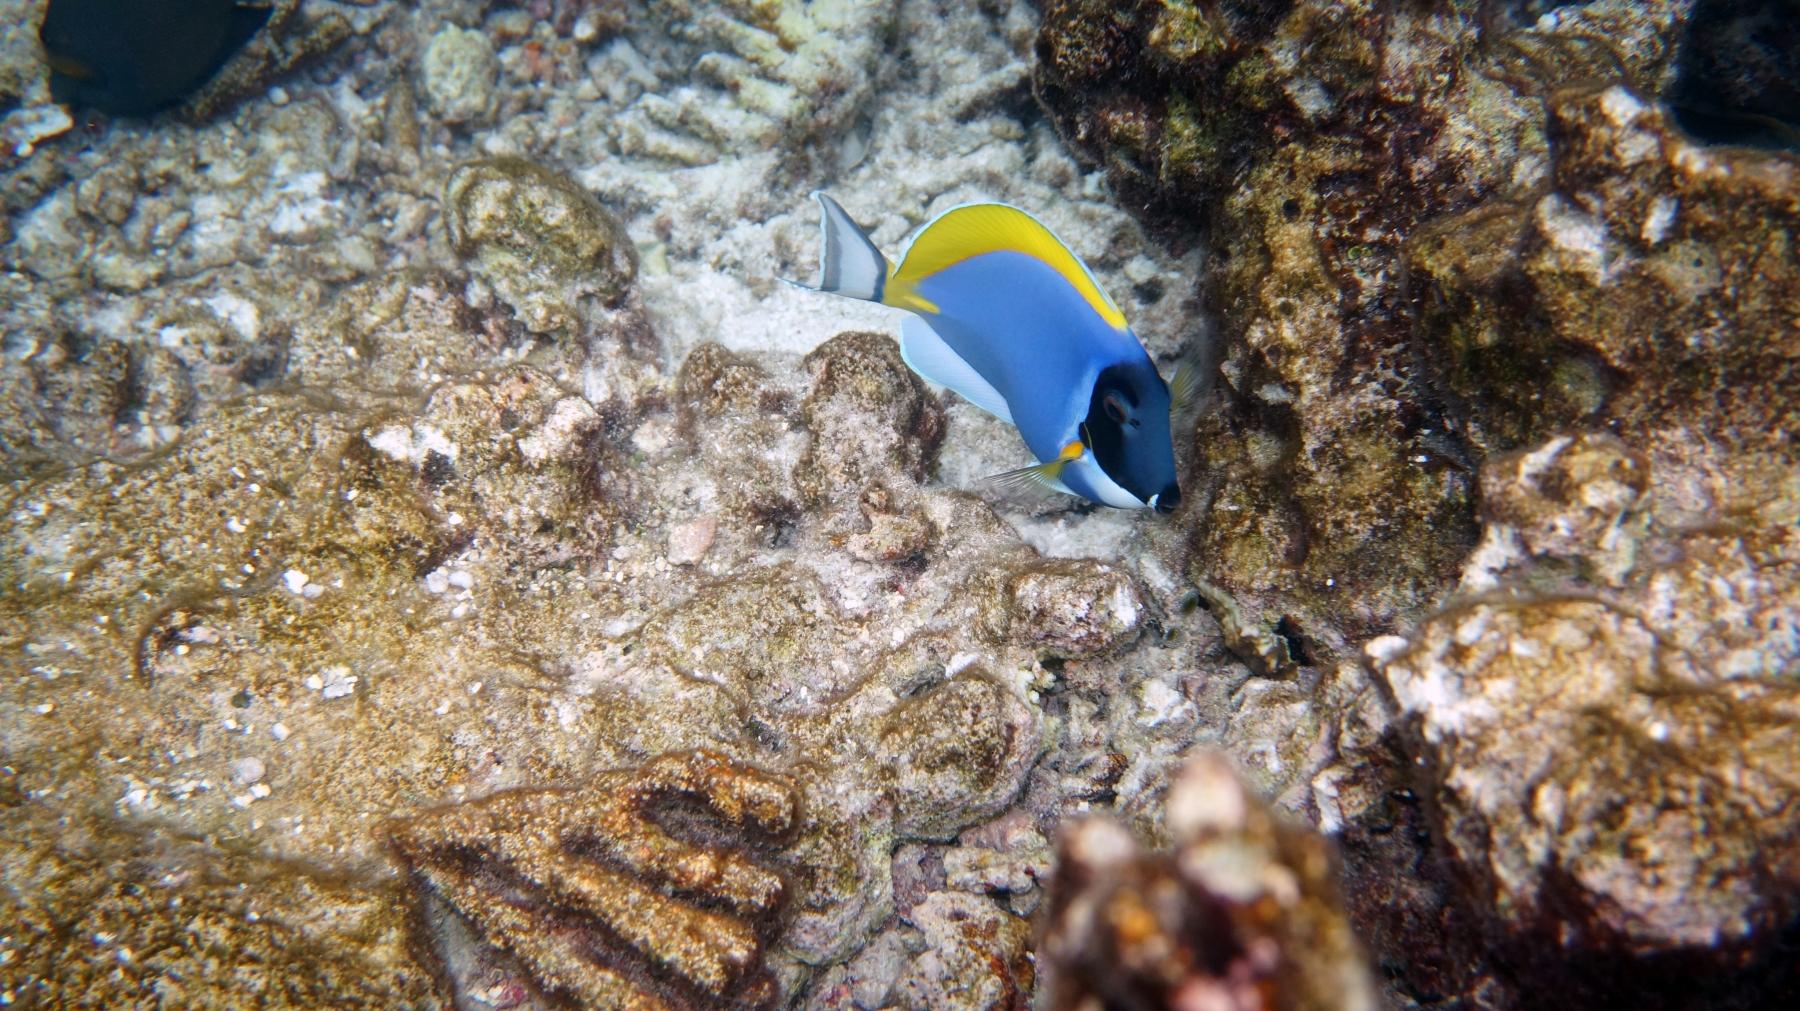 Acanthurus_leucosternon_001_C_Peces-Cirujano_L_Maldivas_U_Sebas_29062015